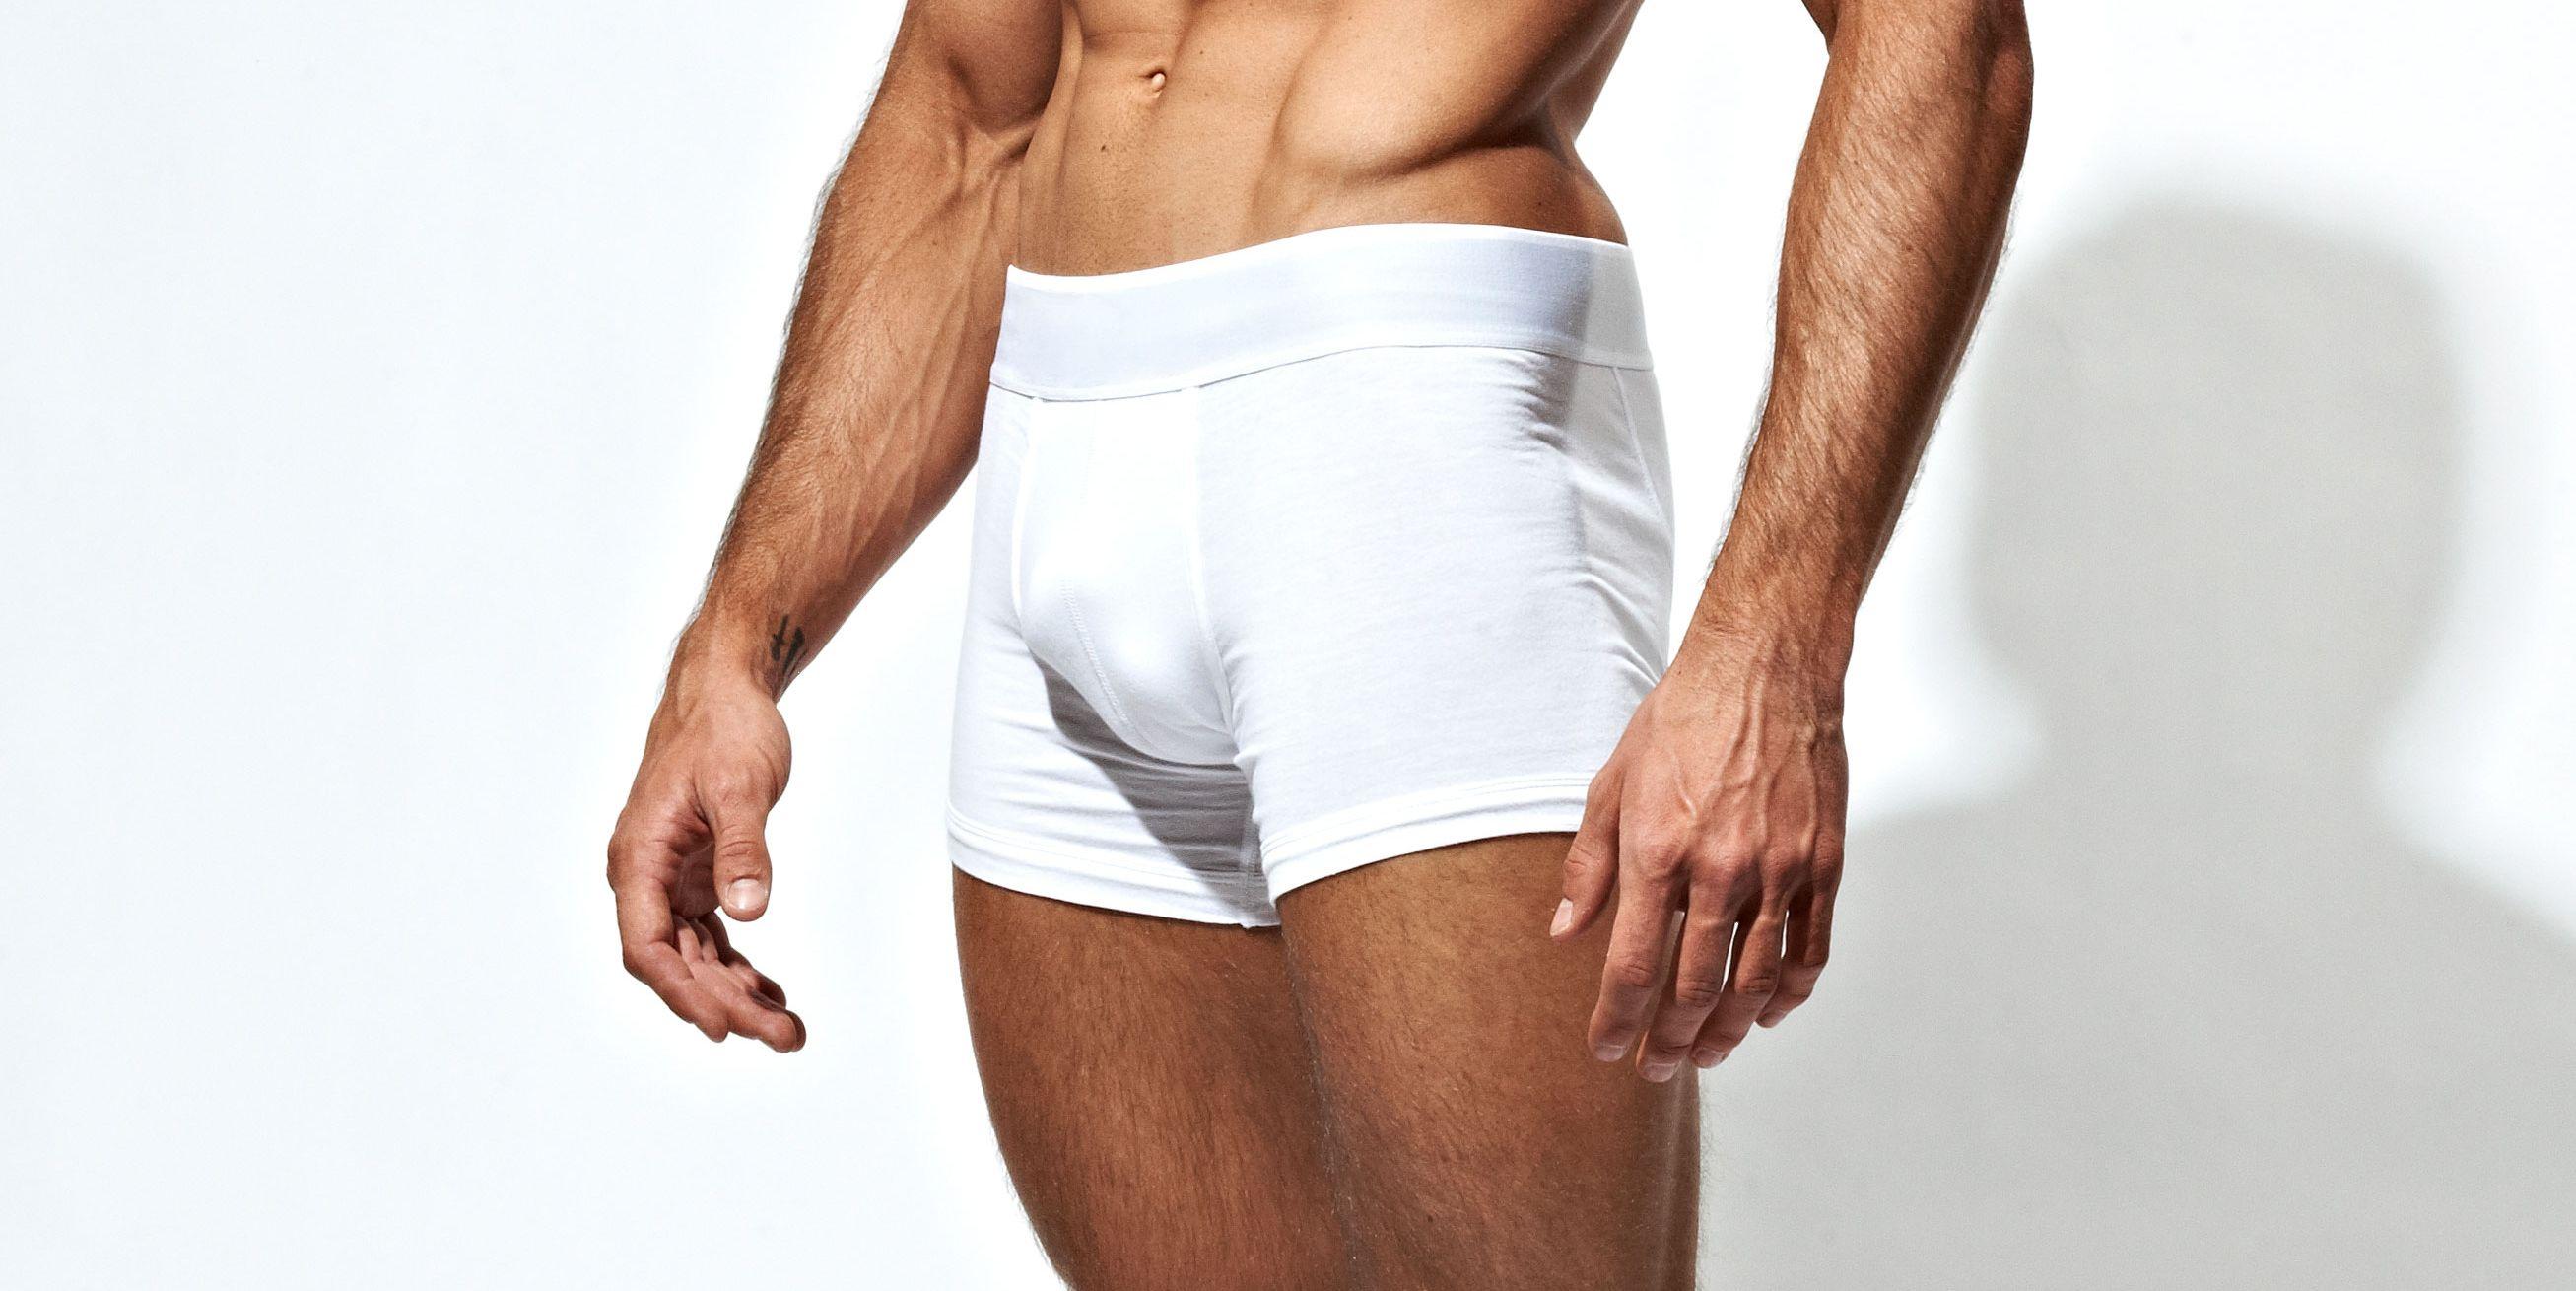 The 10 Best Pairs of Underwear For Men